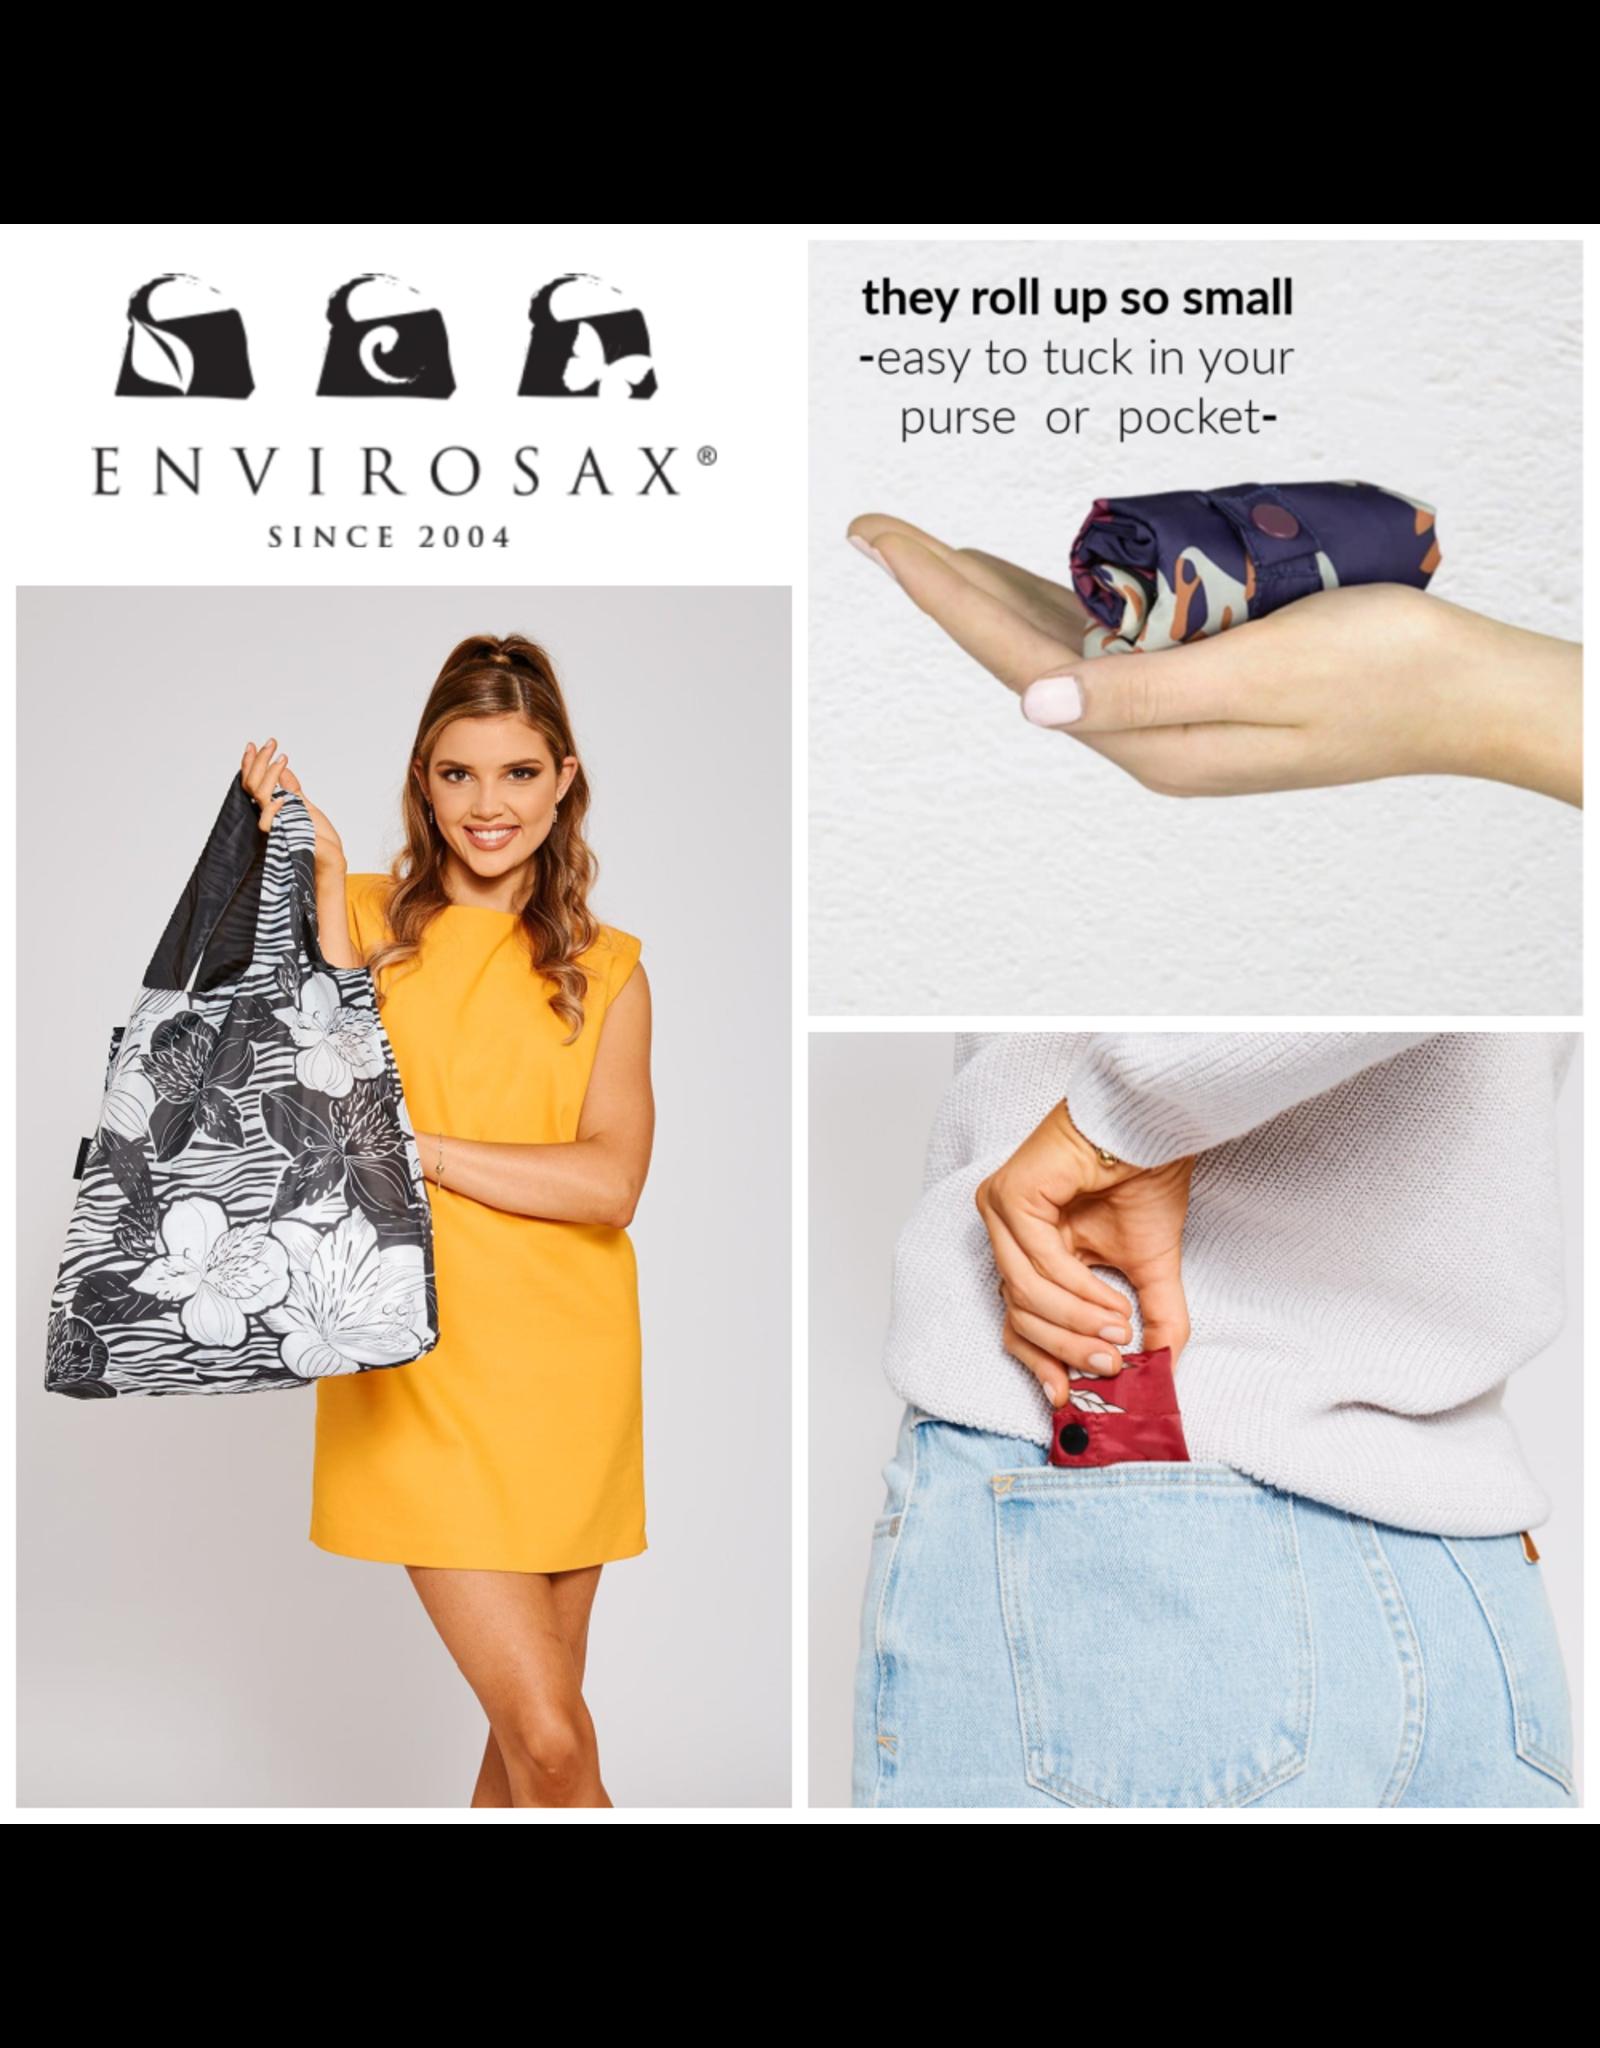 Envirosax Ankara Pomegranates - Pocket Sized Reusuable Bag from Envirosax